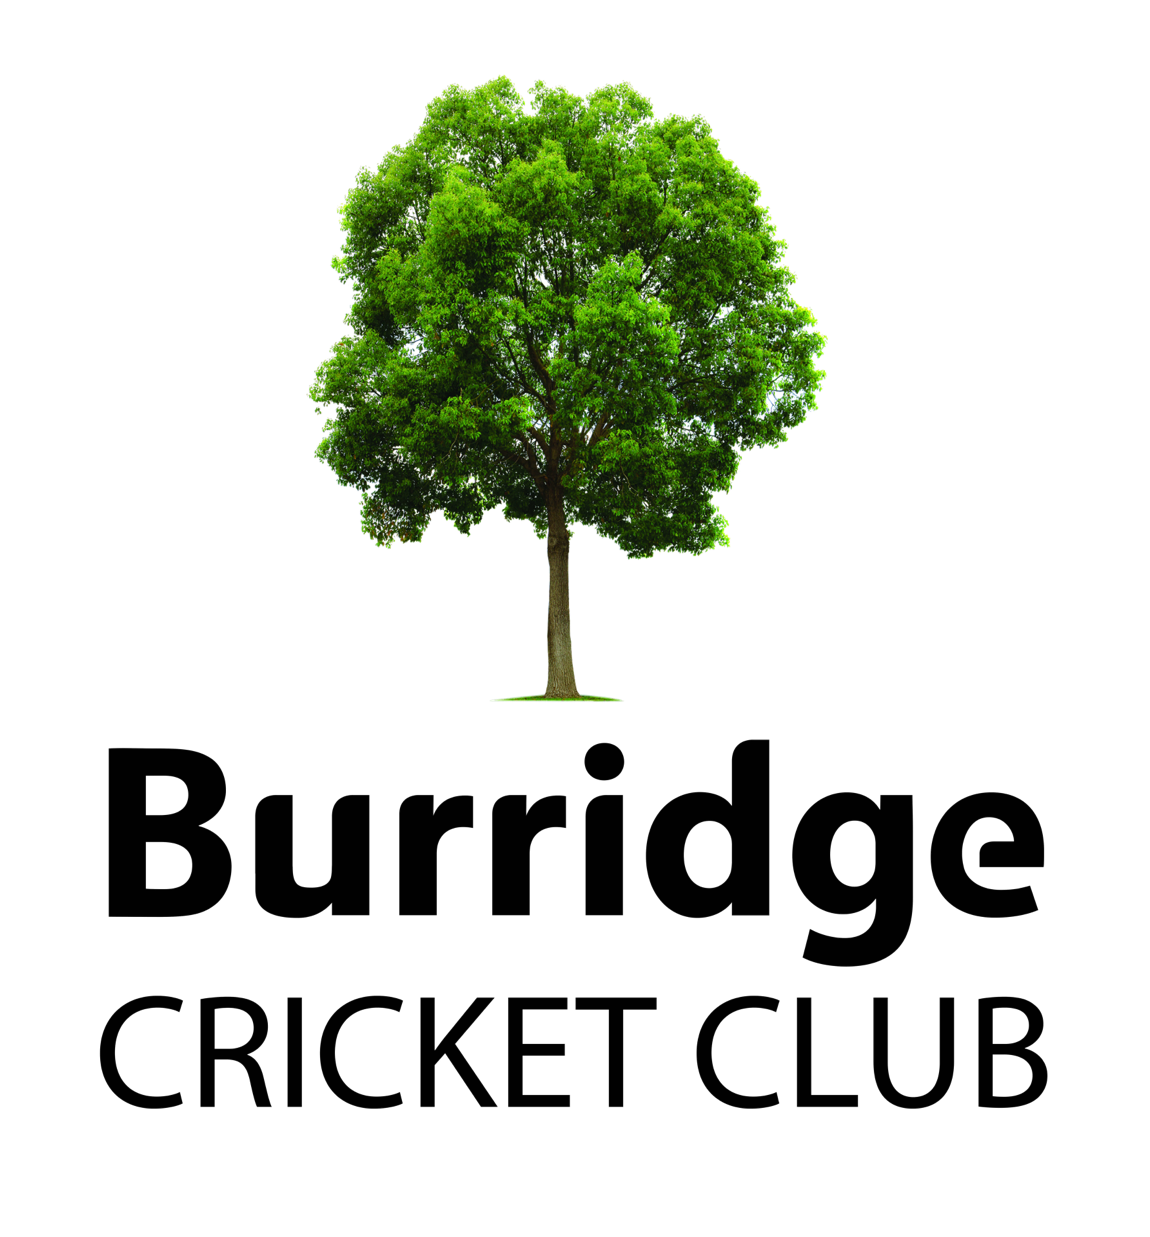 Burridge Cricket Club